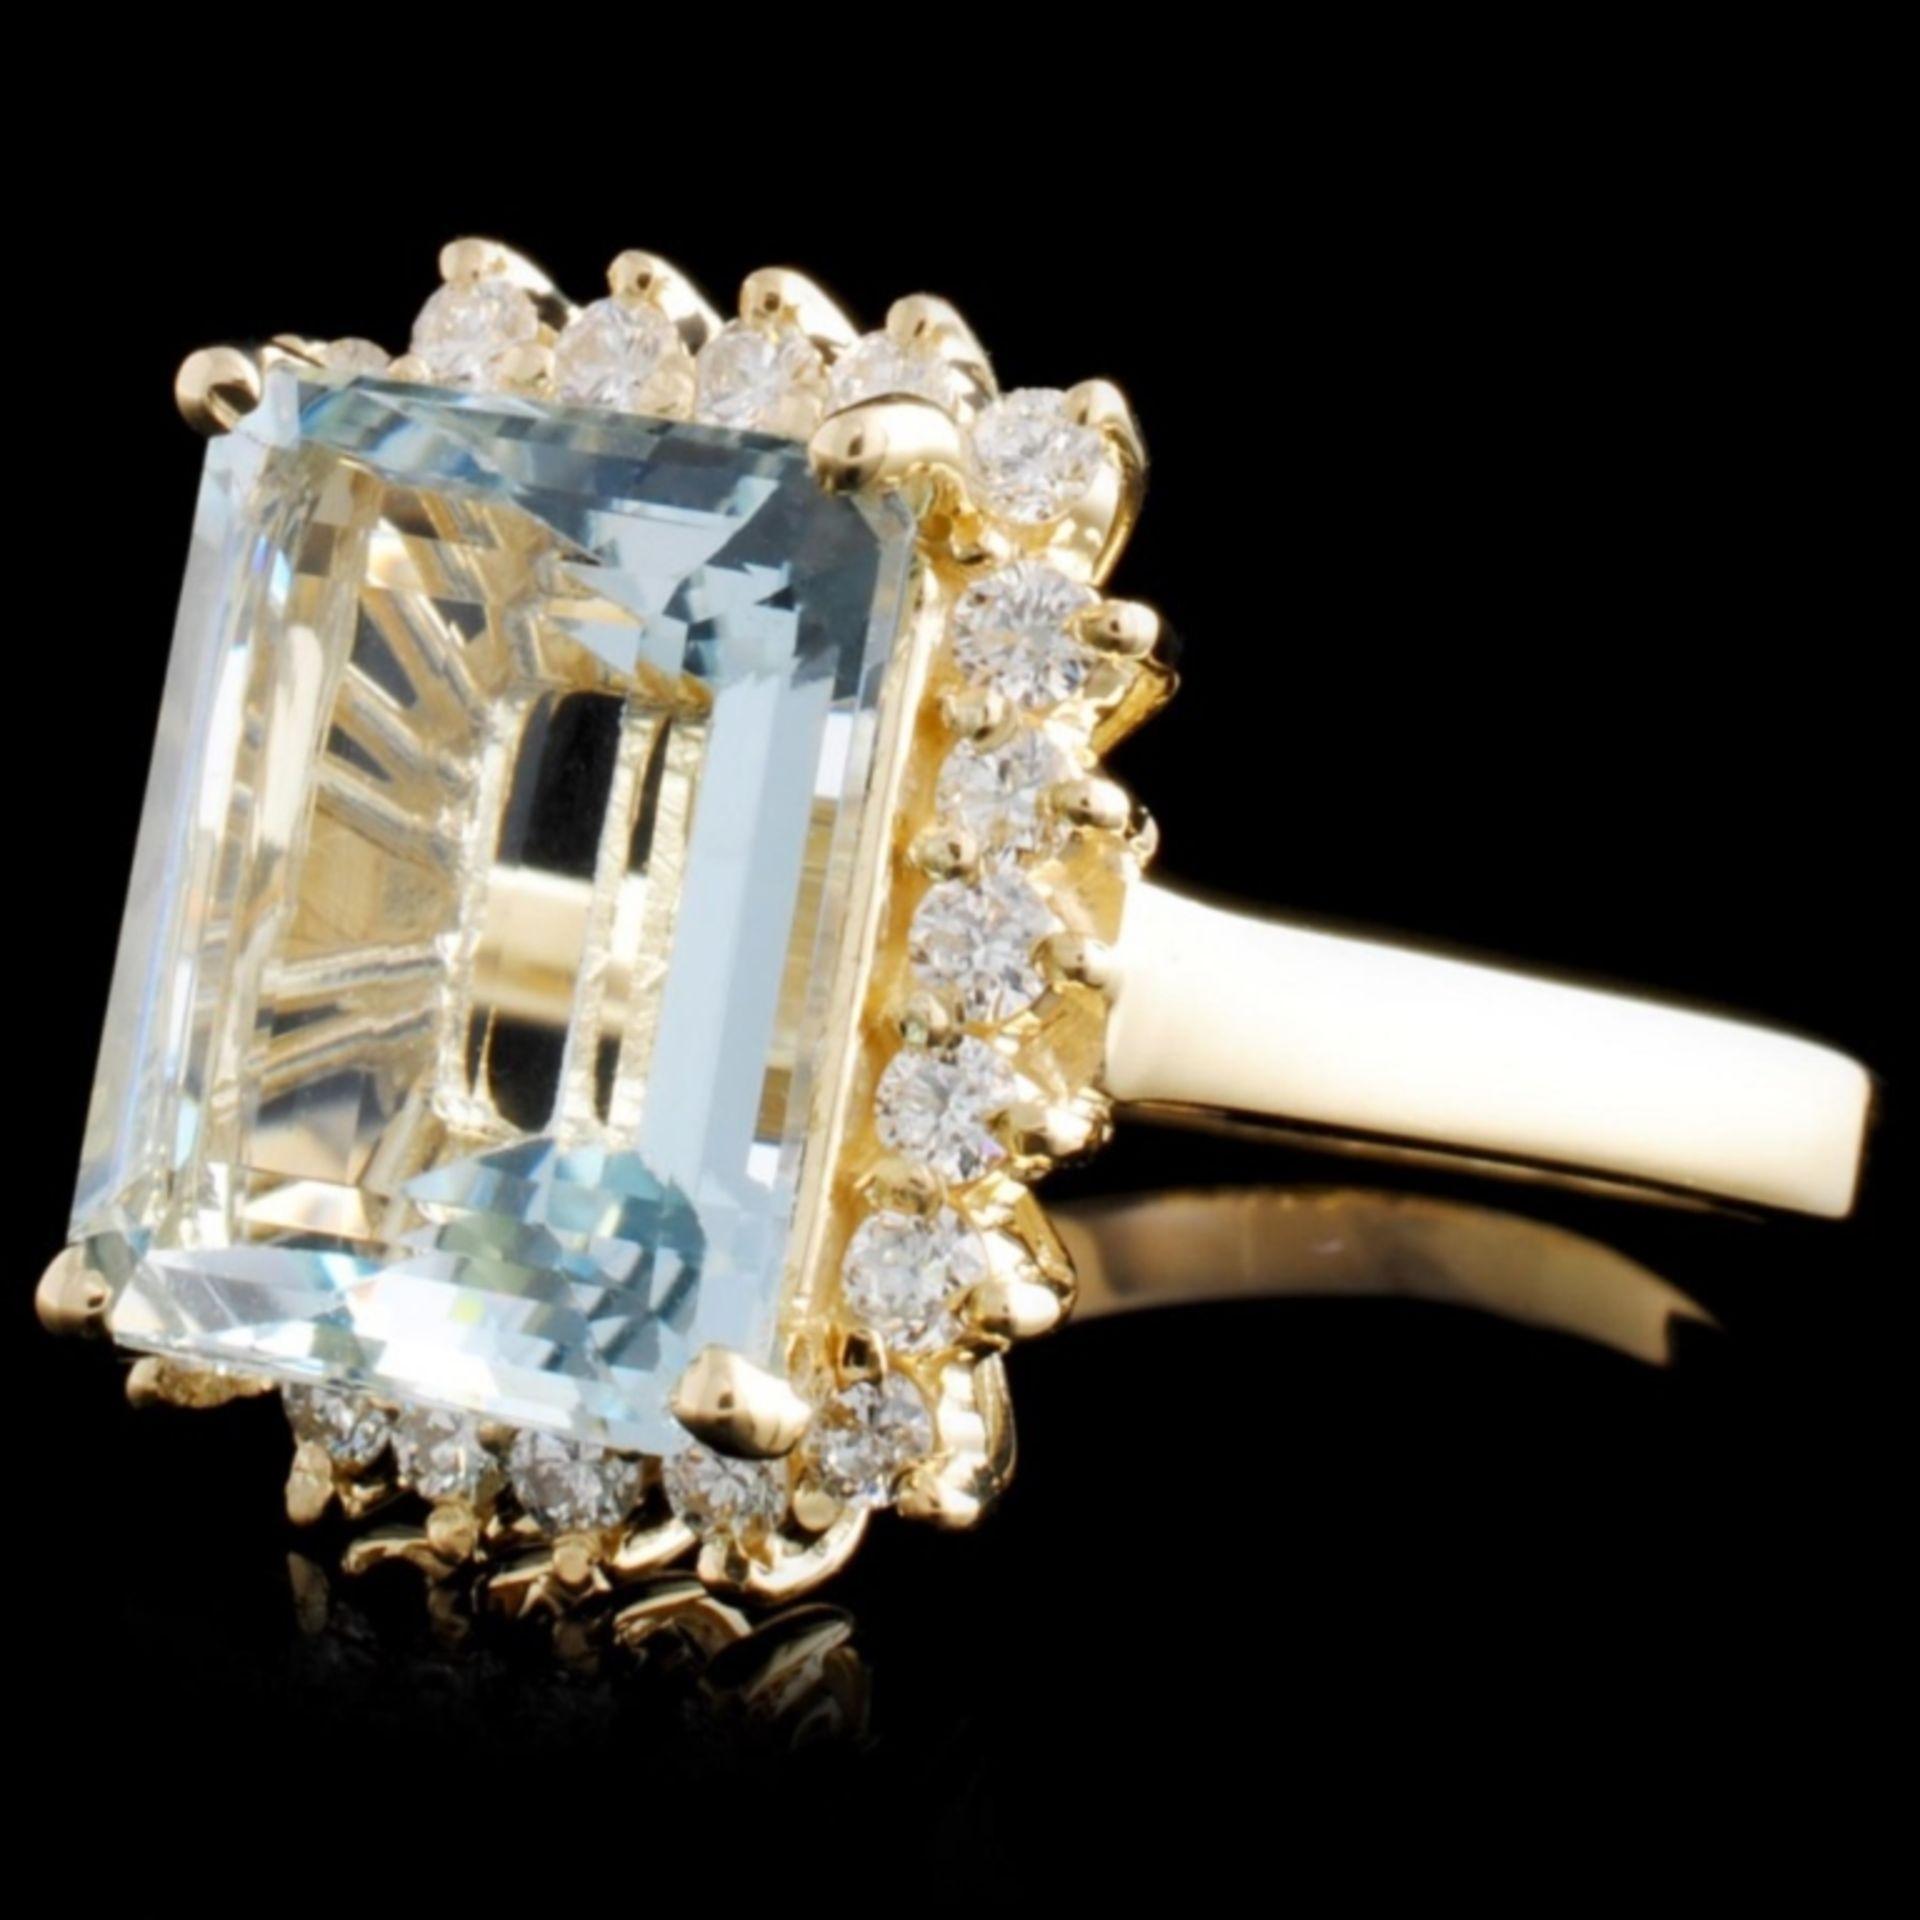 14K Gold 5.45ct Aquamarine & 0.52ctw Diamond Ring - Image 2 of 4